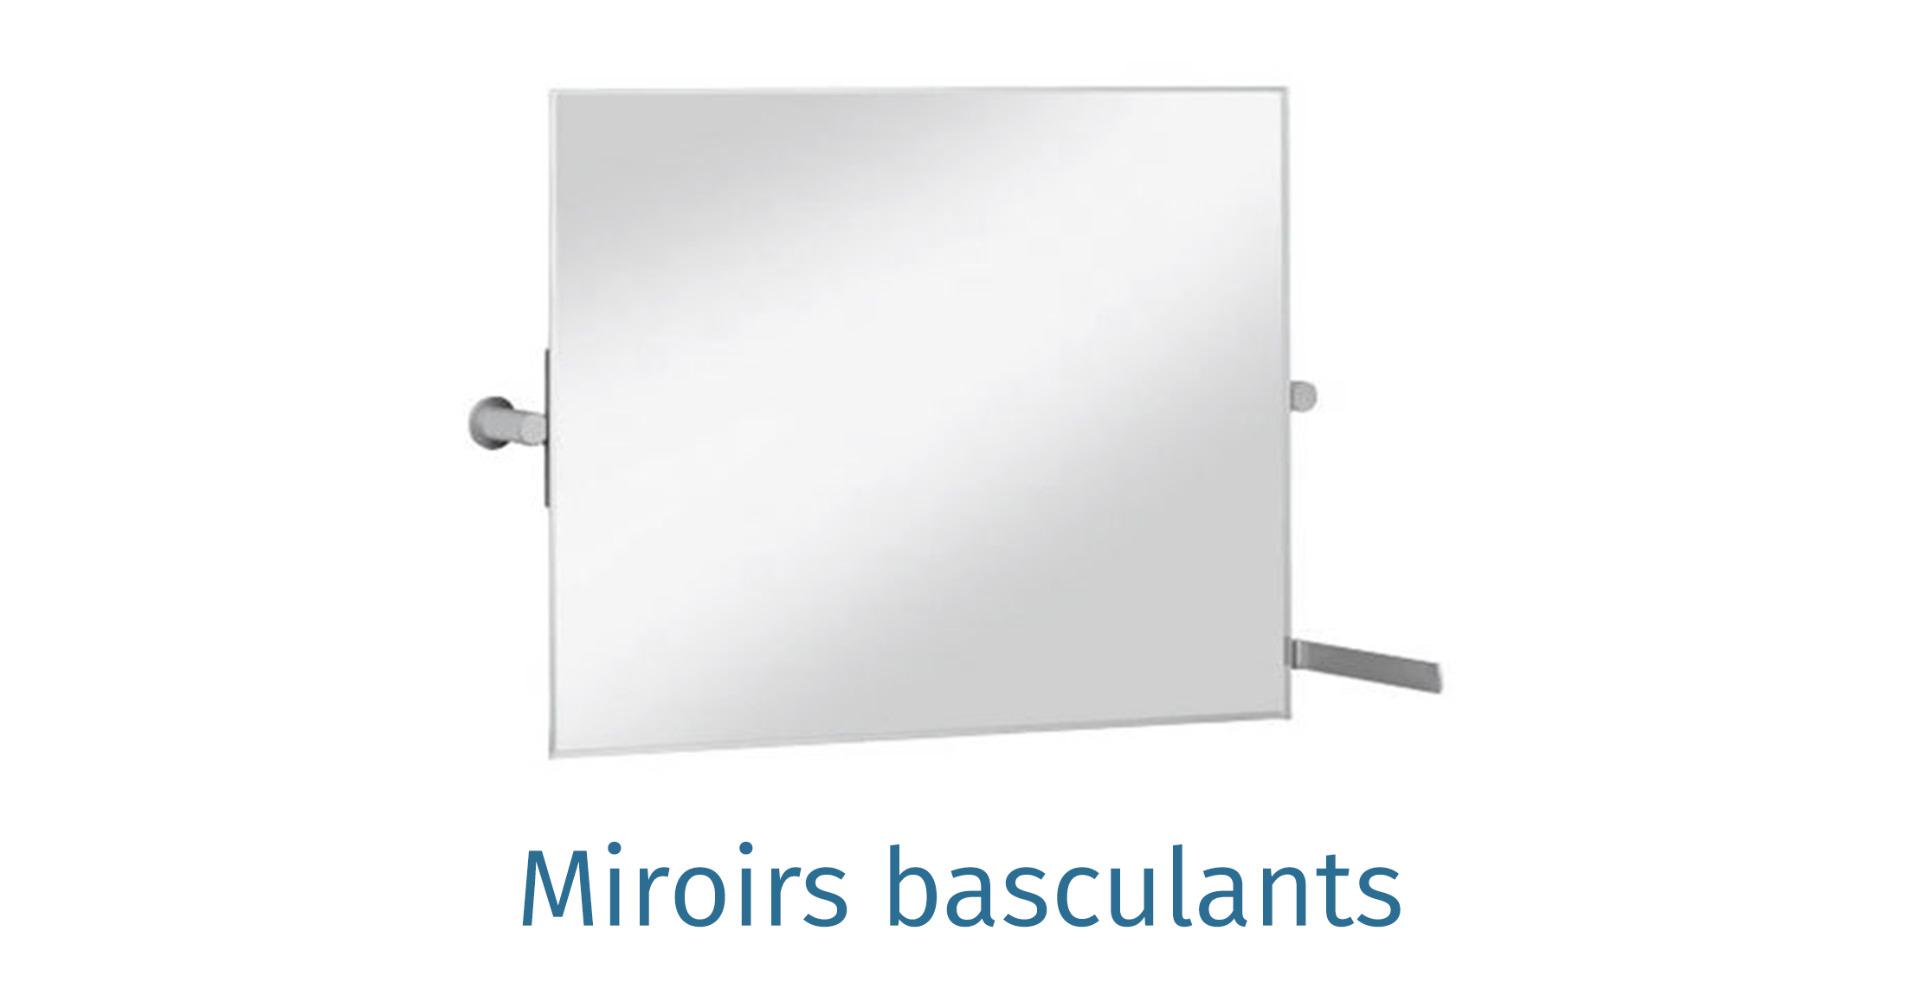 Miroirs basculants